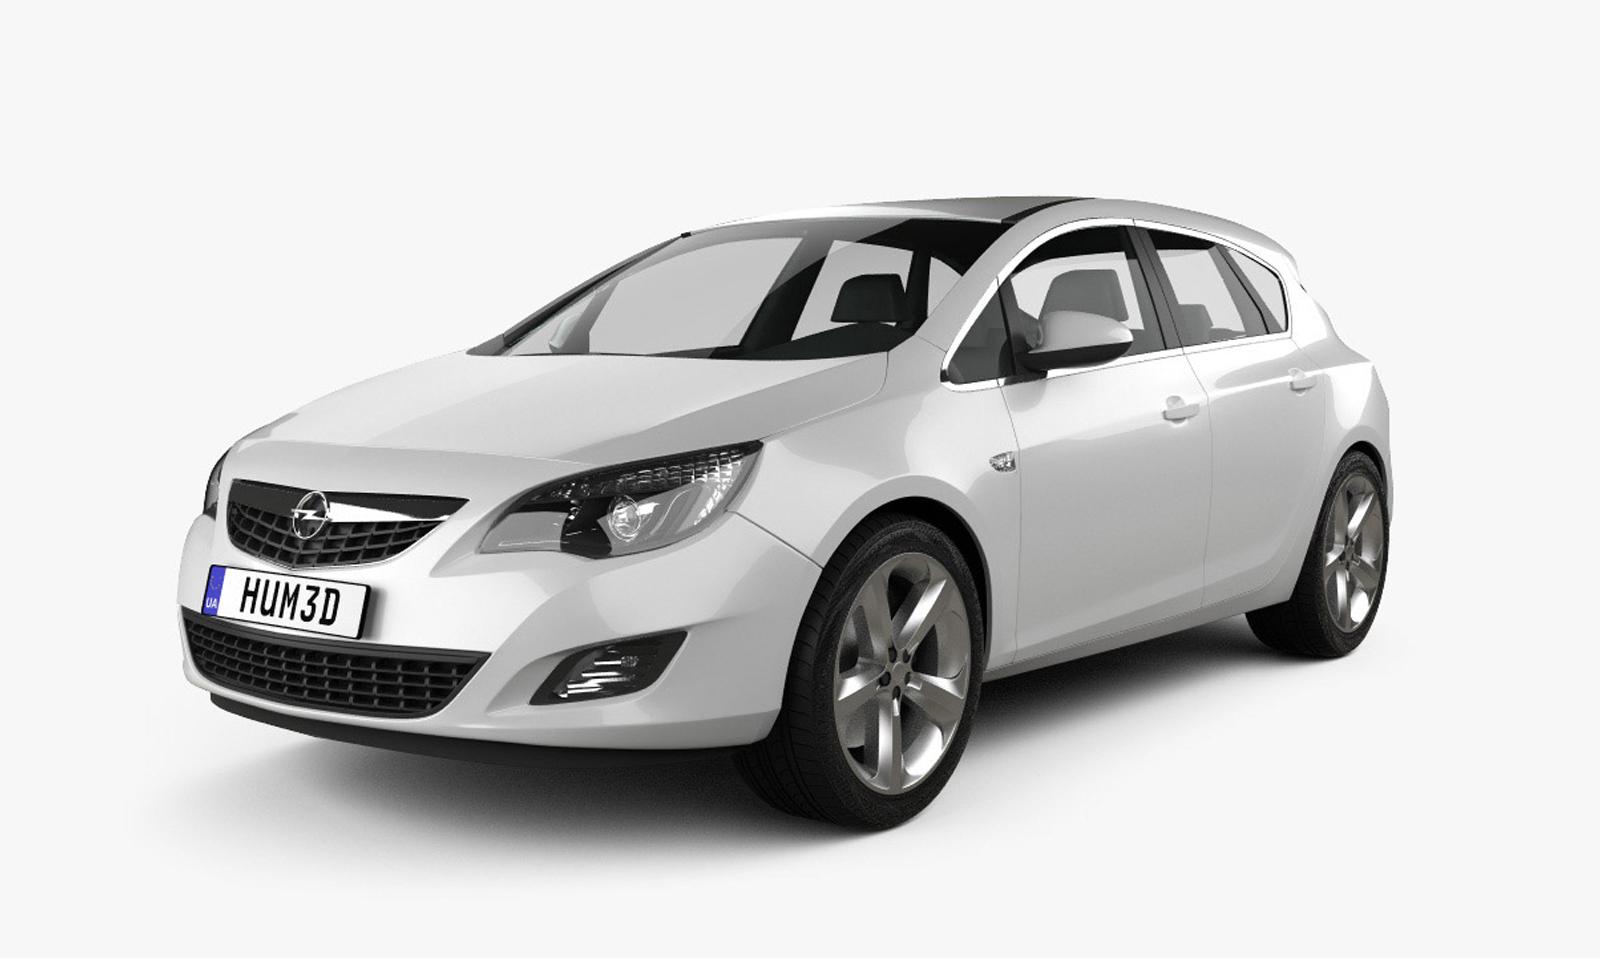 Inchirieri Auto Masini Ieftine Bucuresti, Otopeni – Inchirieri Opel Astra J - cutie automata – Oferte speciale la inchiriere!